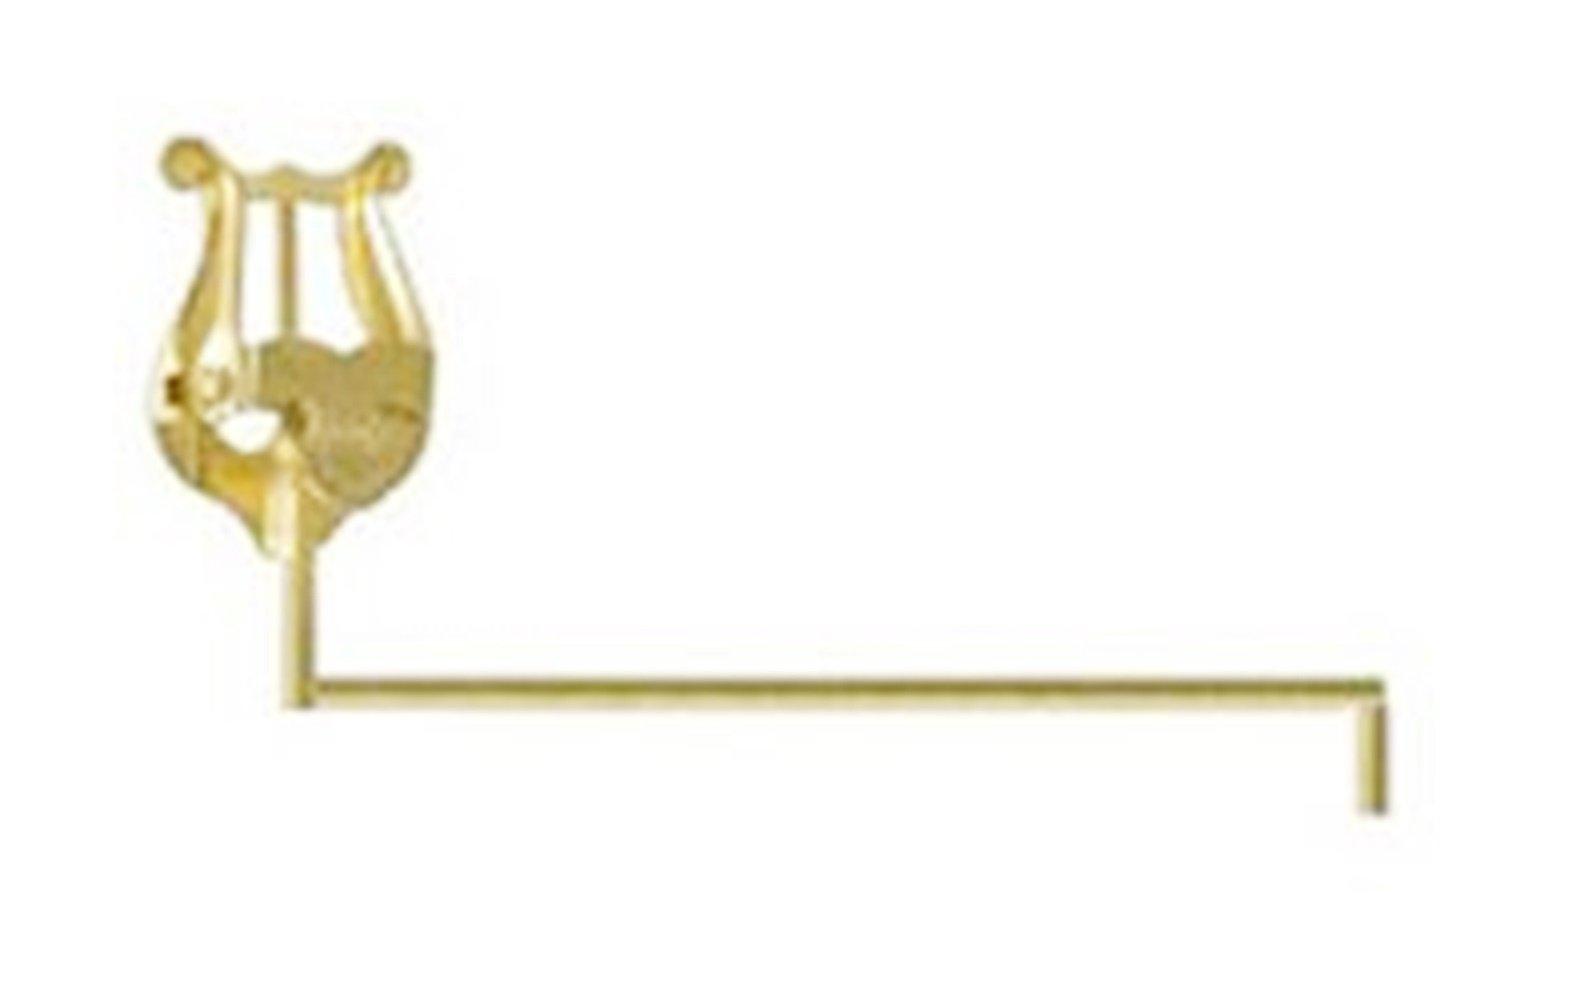 Sousaphone Lyre Yamaha YAC1512 Marching Tuba Lyre Lacquered Brass